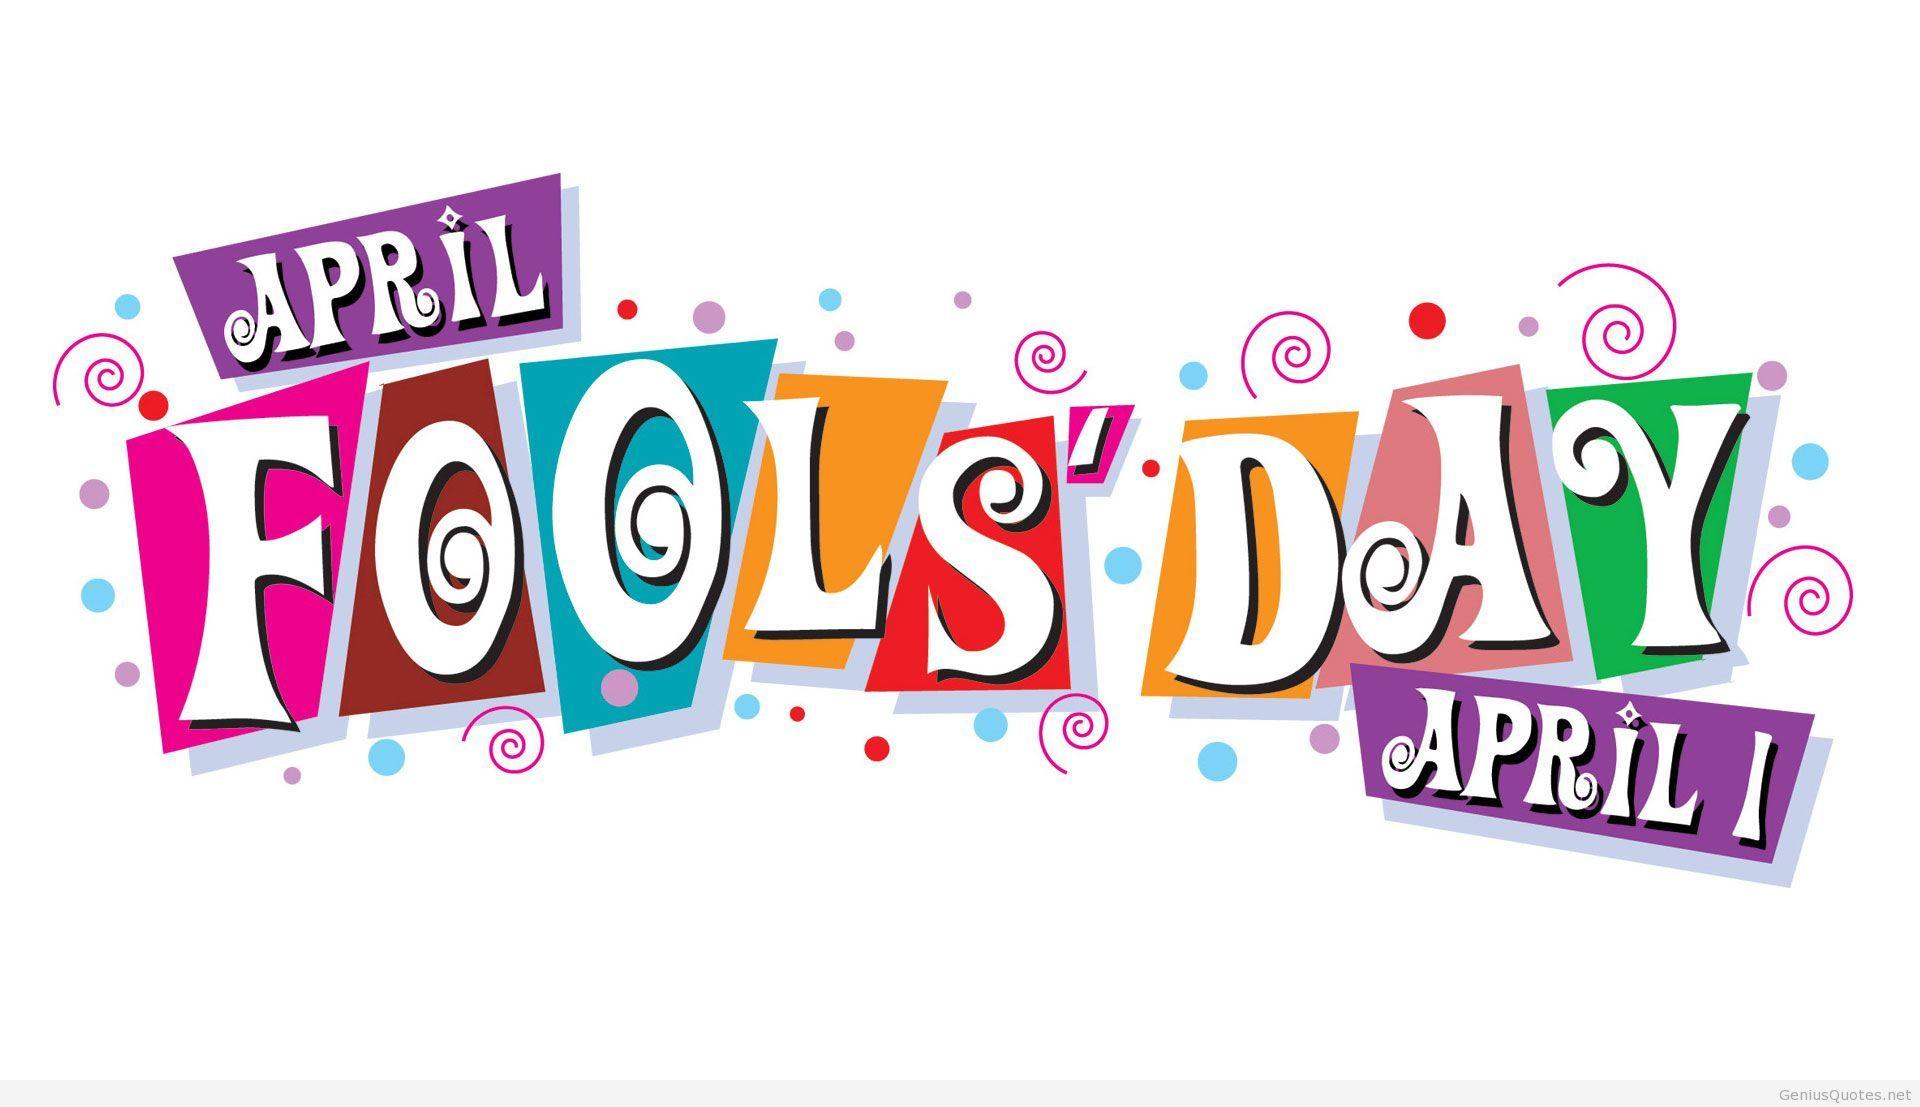 April-fool-day-2014.jpg